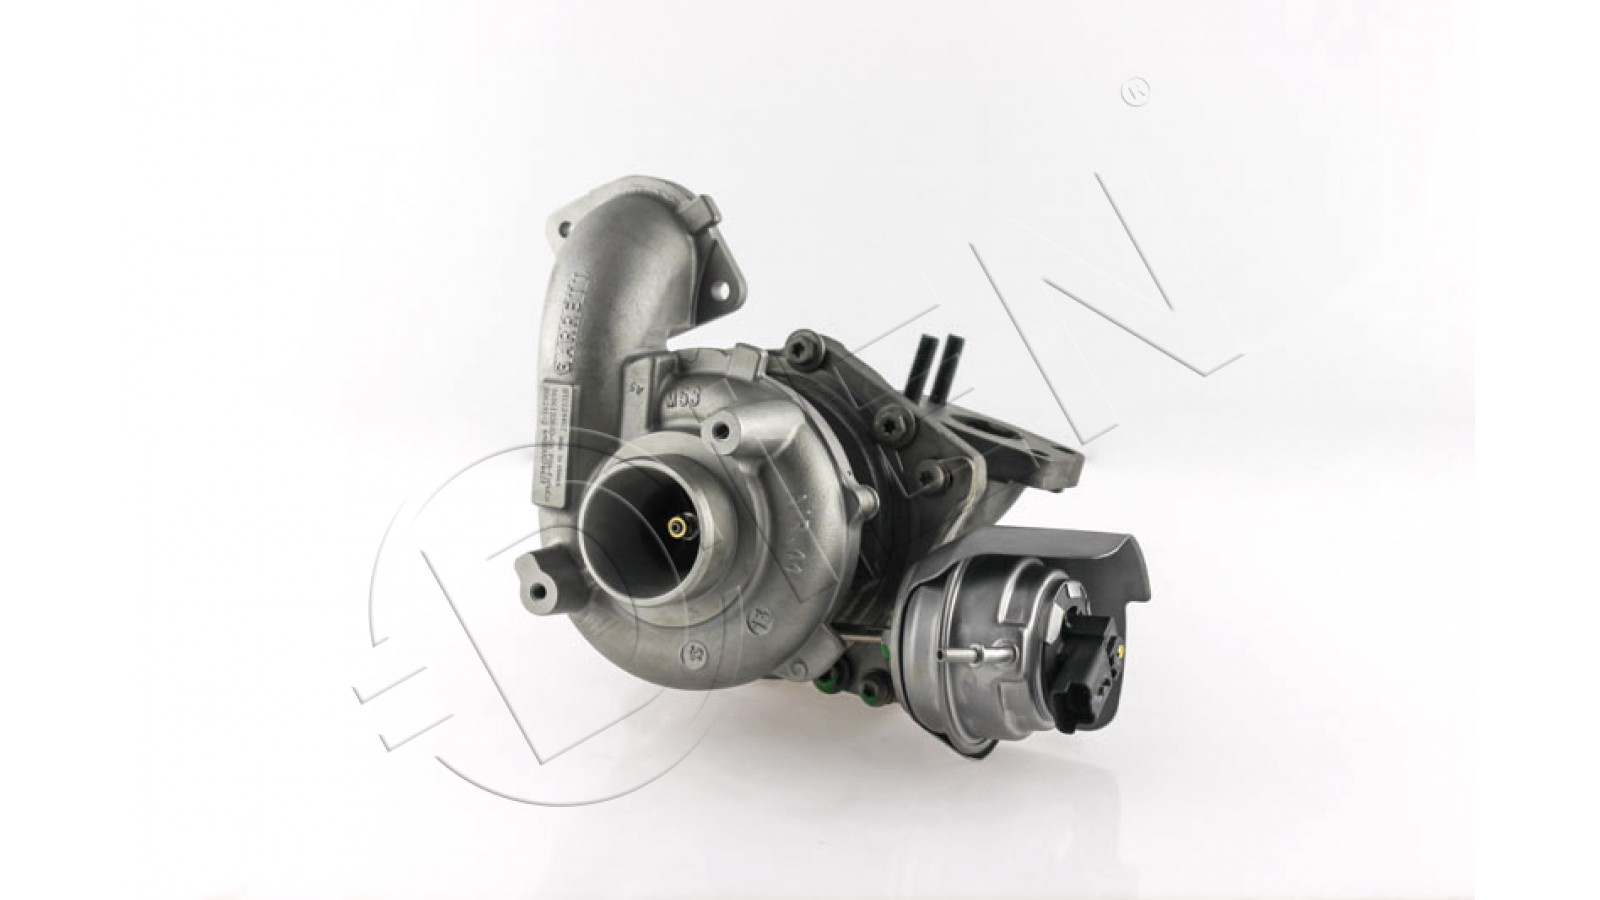 Turbocompressore  VOLVO  S40 II  1.6 D2  115Cv  1560ccm  ott 2010